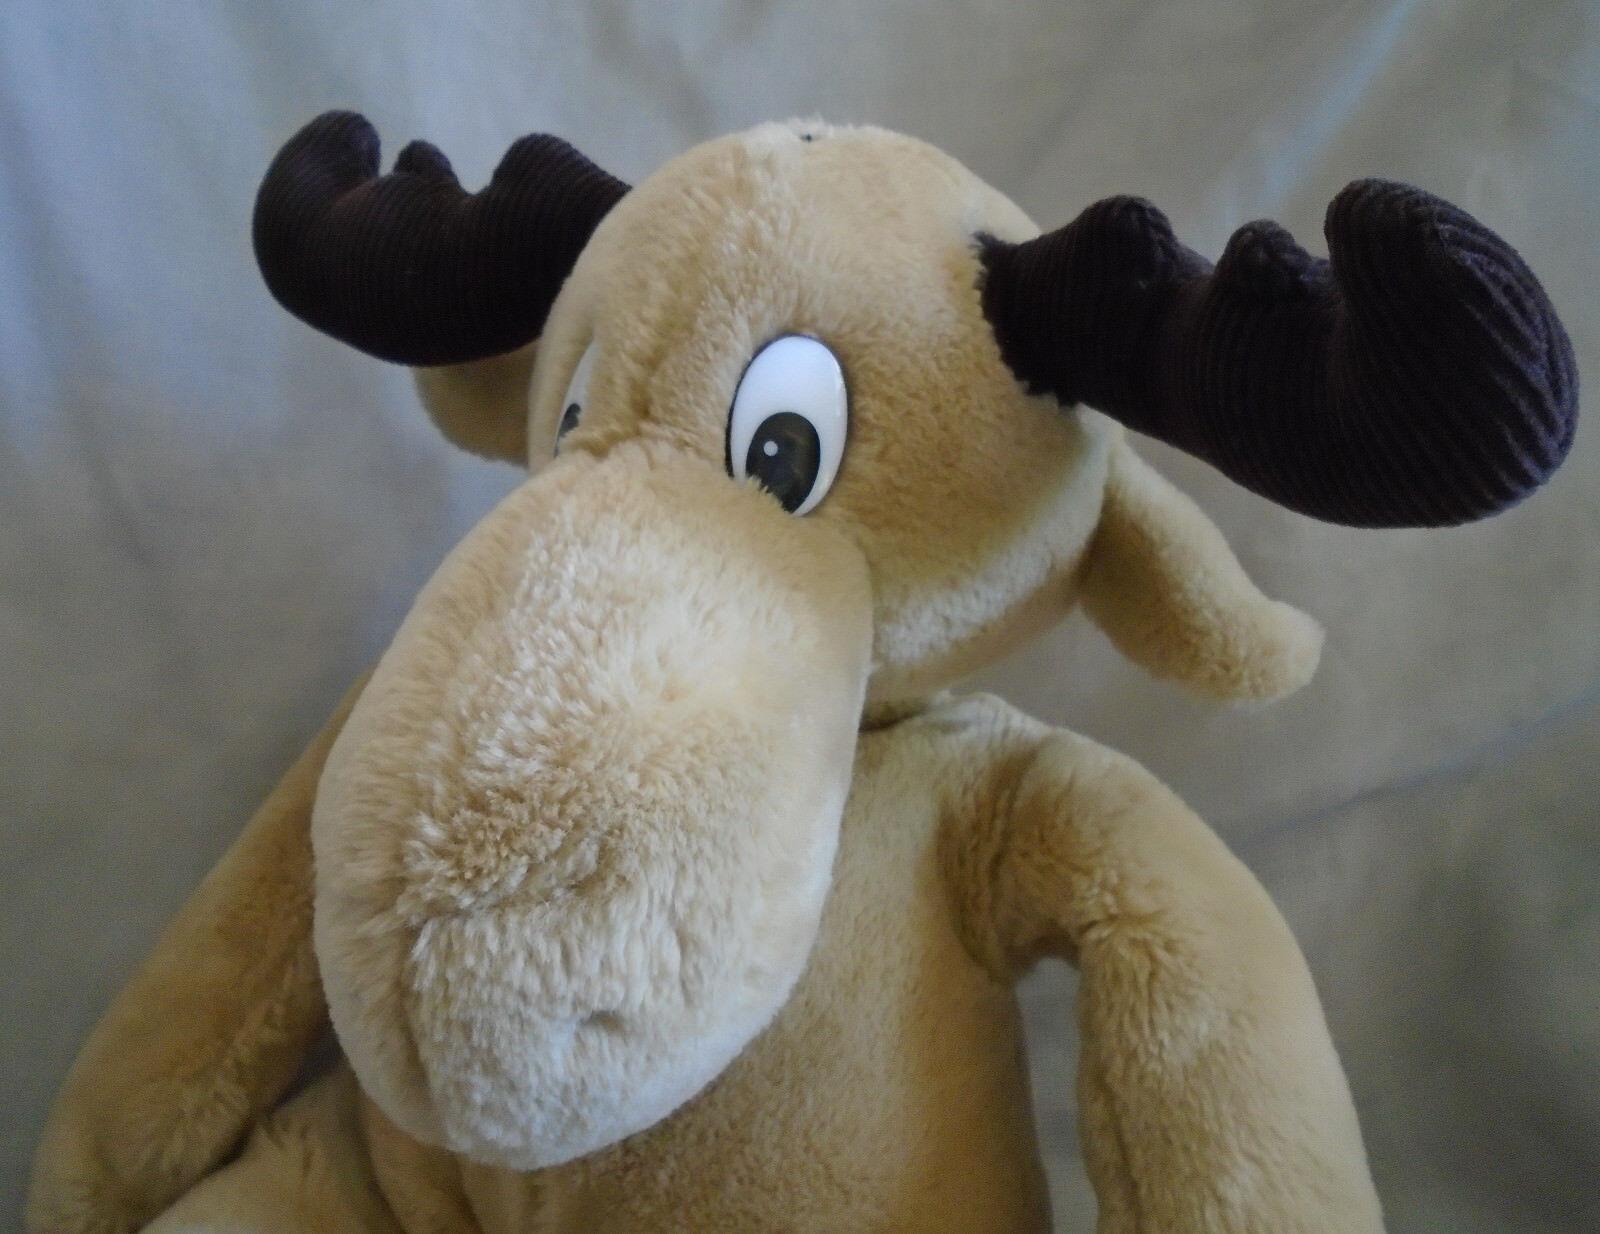 Vintage 1987 Commonwealth Moose Plush Stuffed Animal Toy Tan Brown Brown Brown 14  Seated 26fa0b